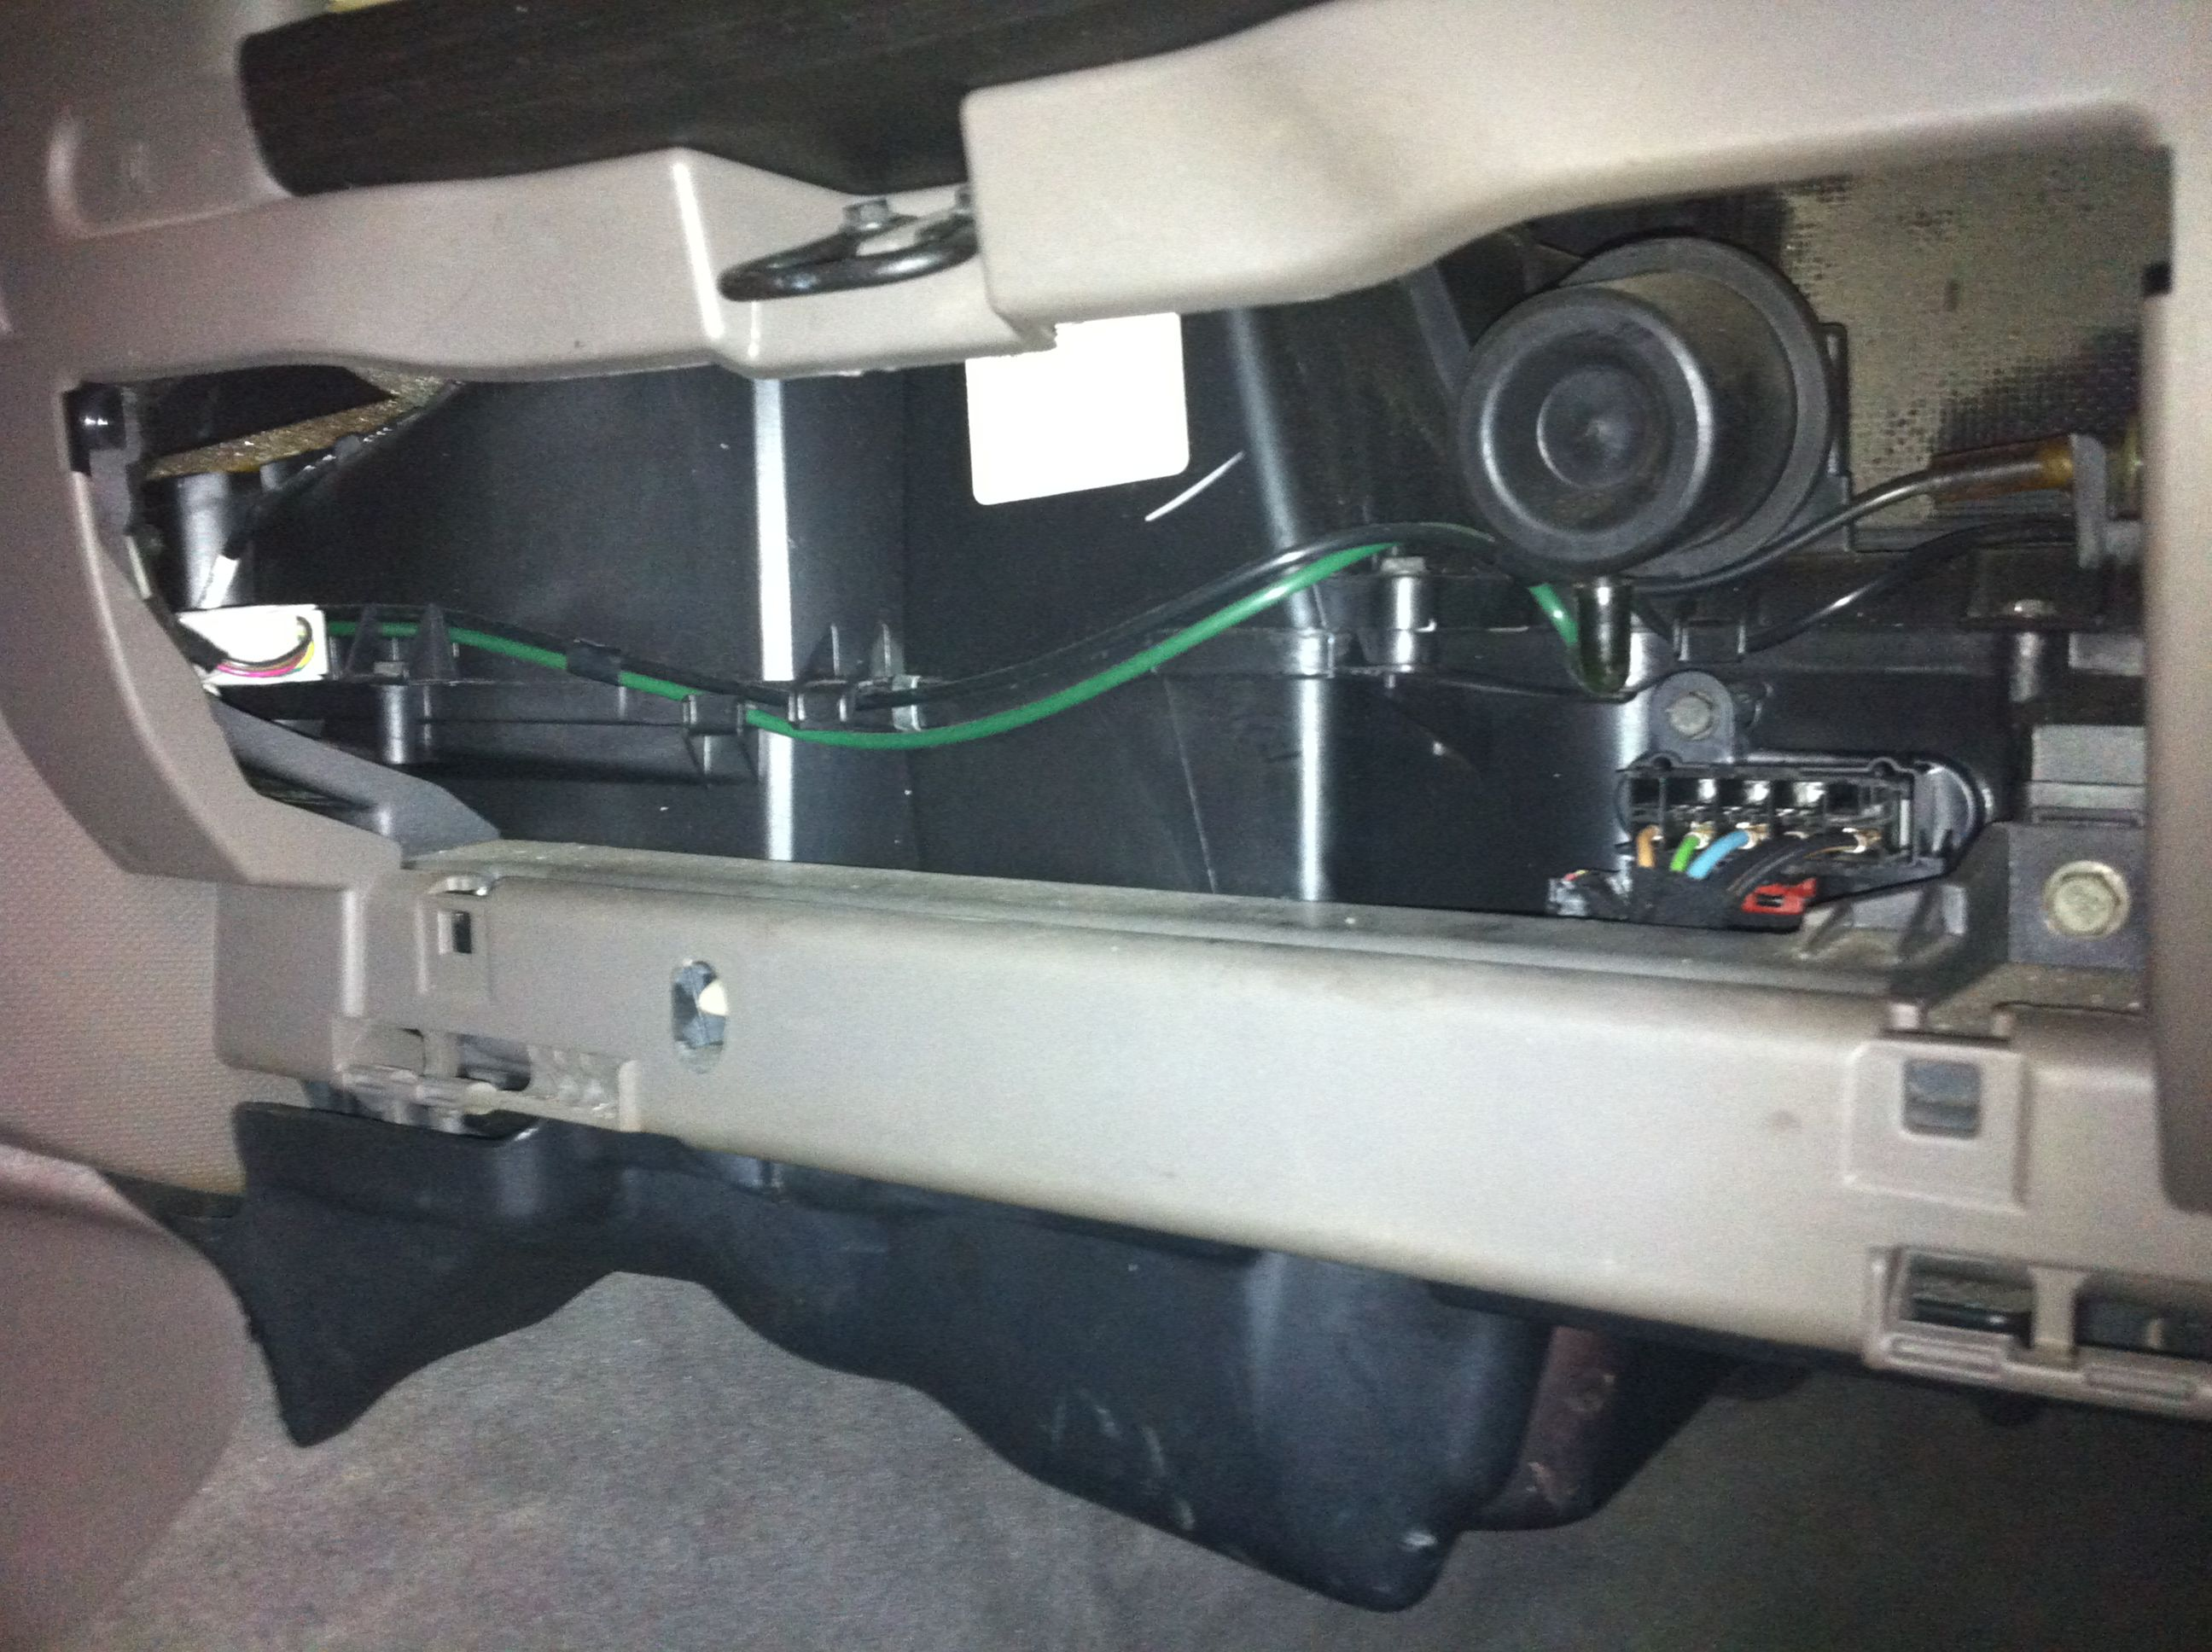 2005 Dodge Caravan Fuel Filter Location Jeep Cherokee